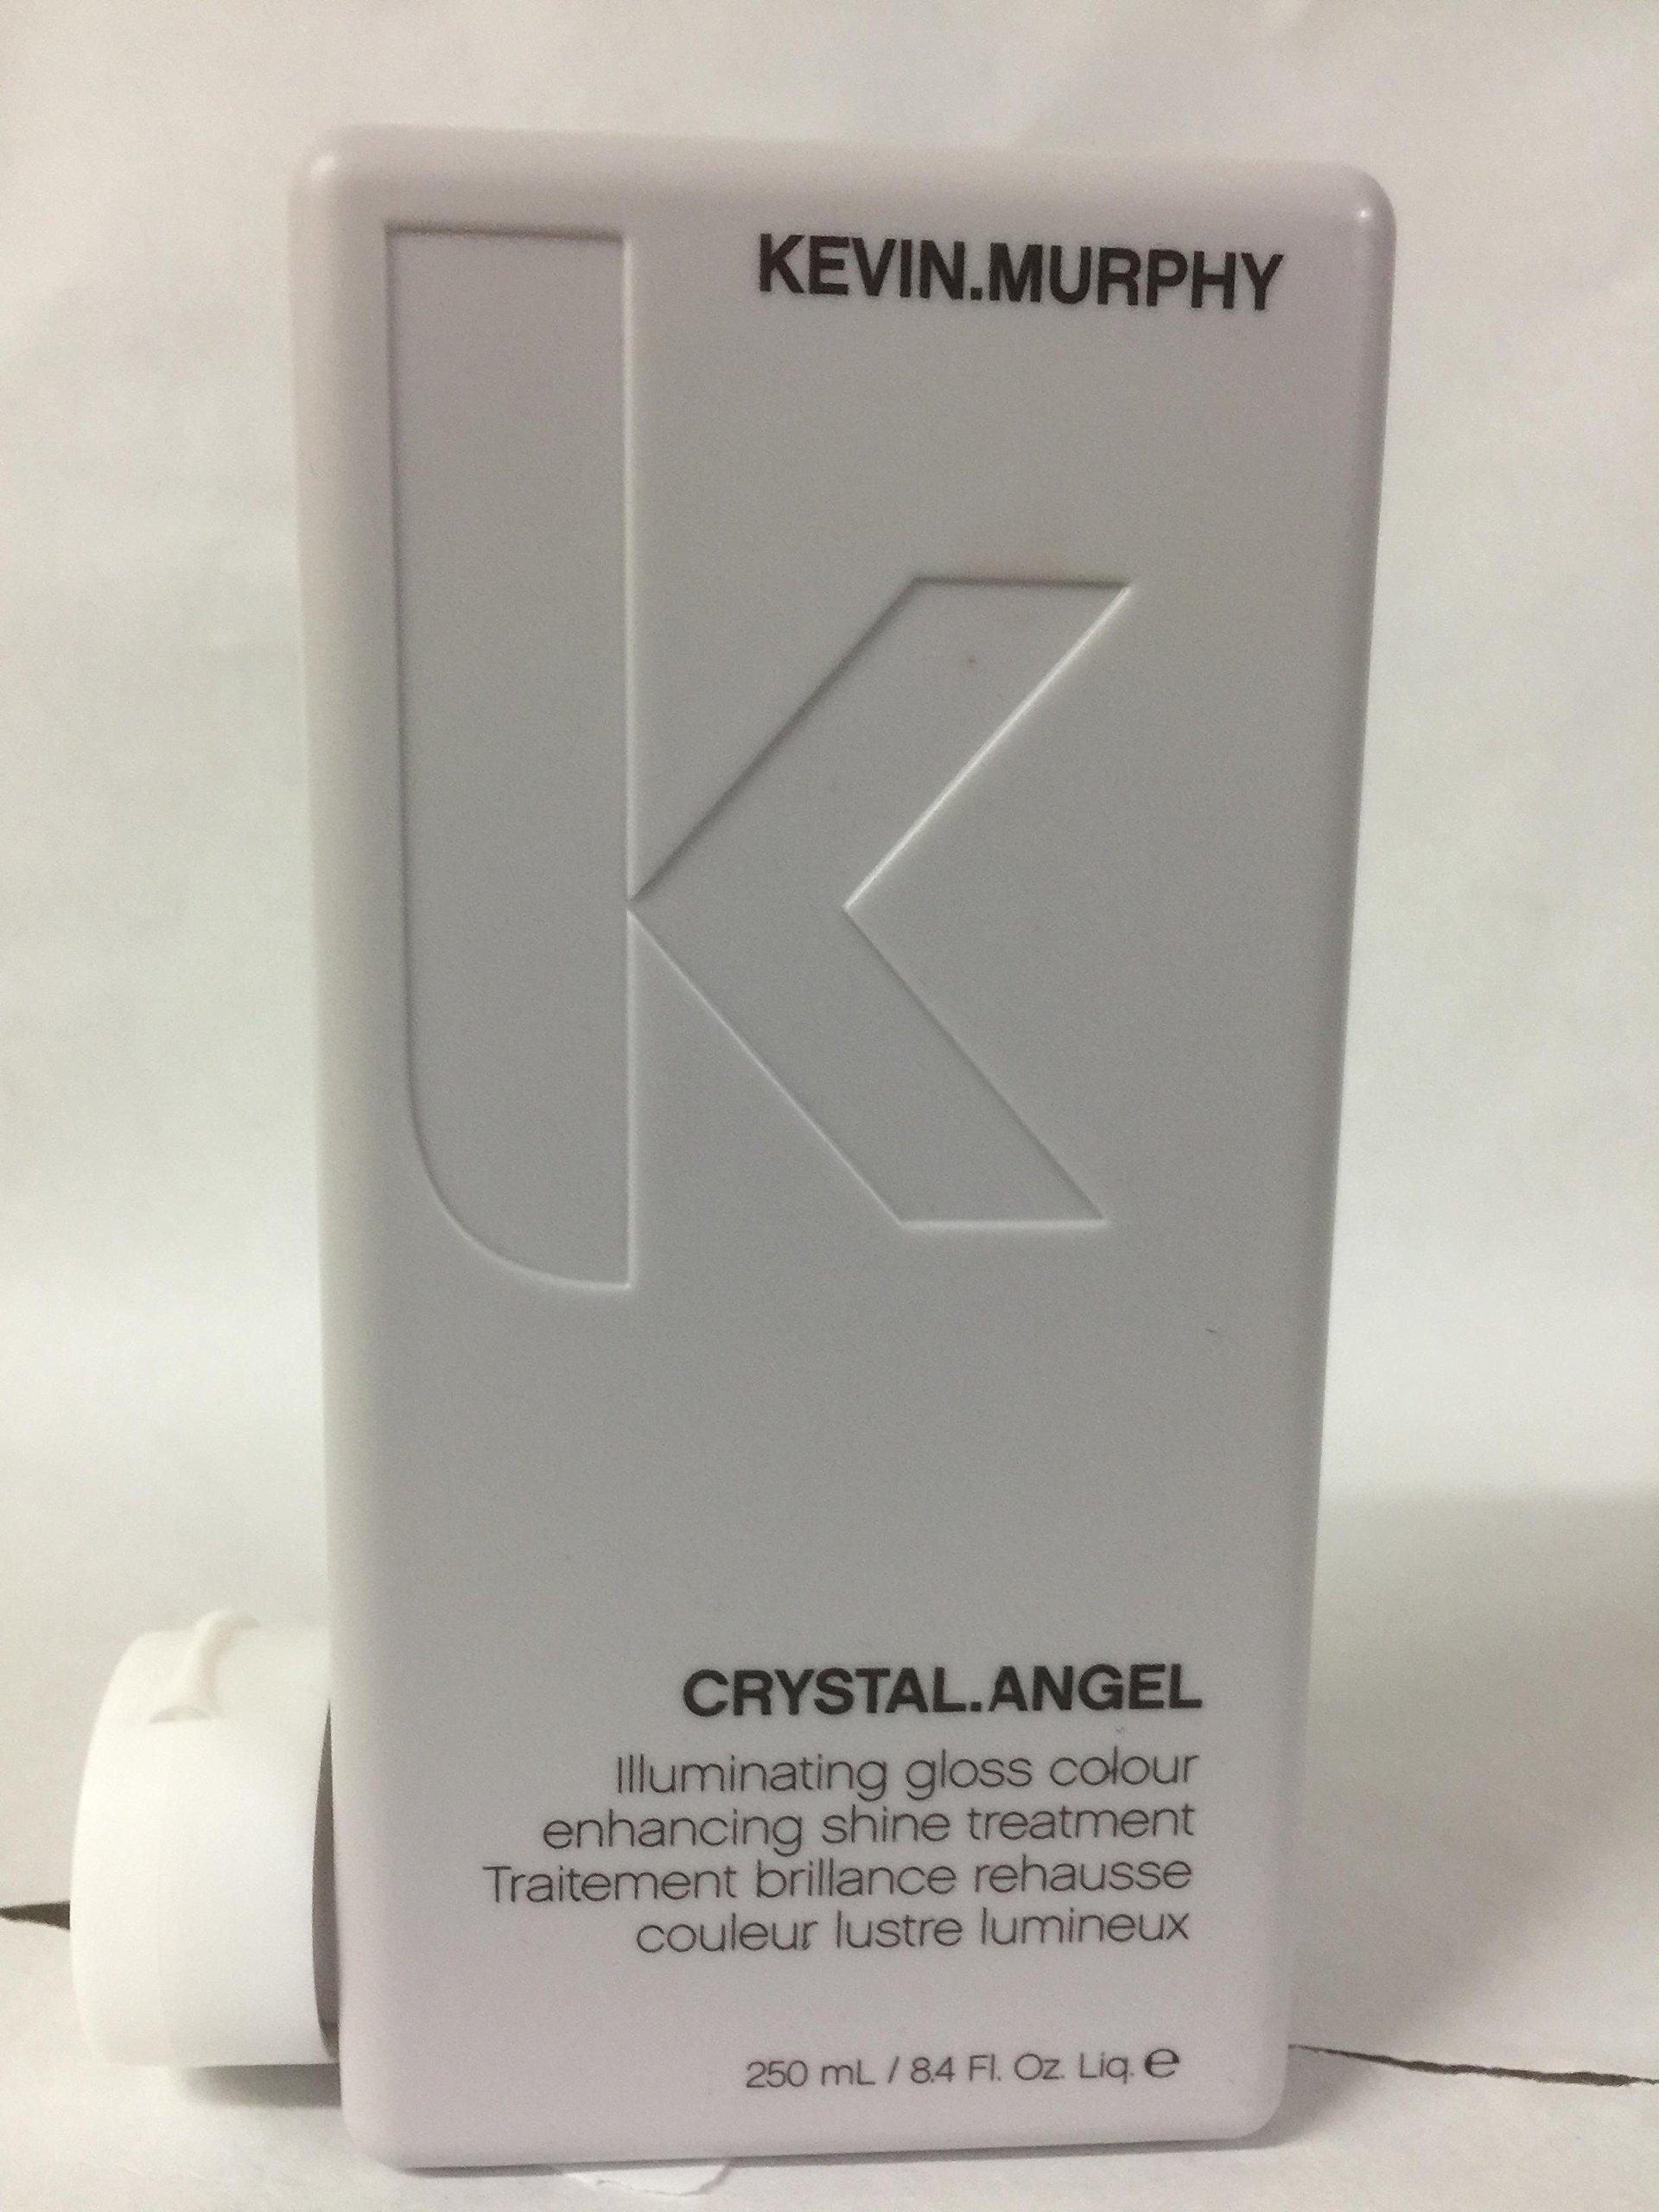 Kevin Murphy Crystal Angel, Illuminating Gloss Colur Enhancing Shine Treatment 8.4 oz